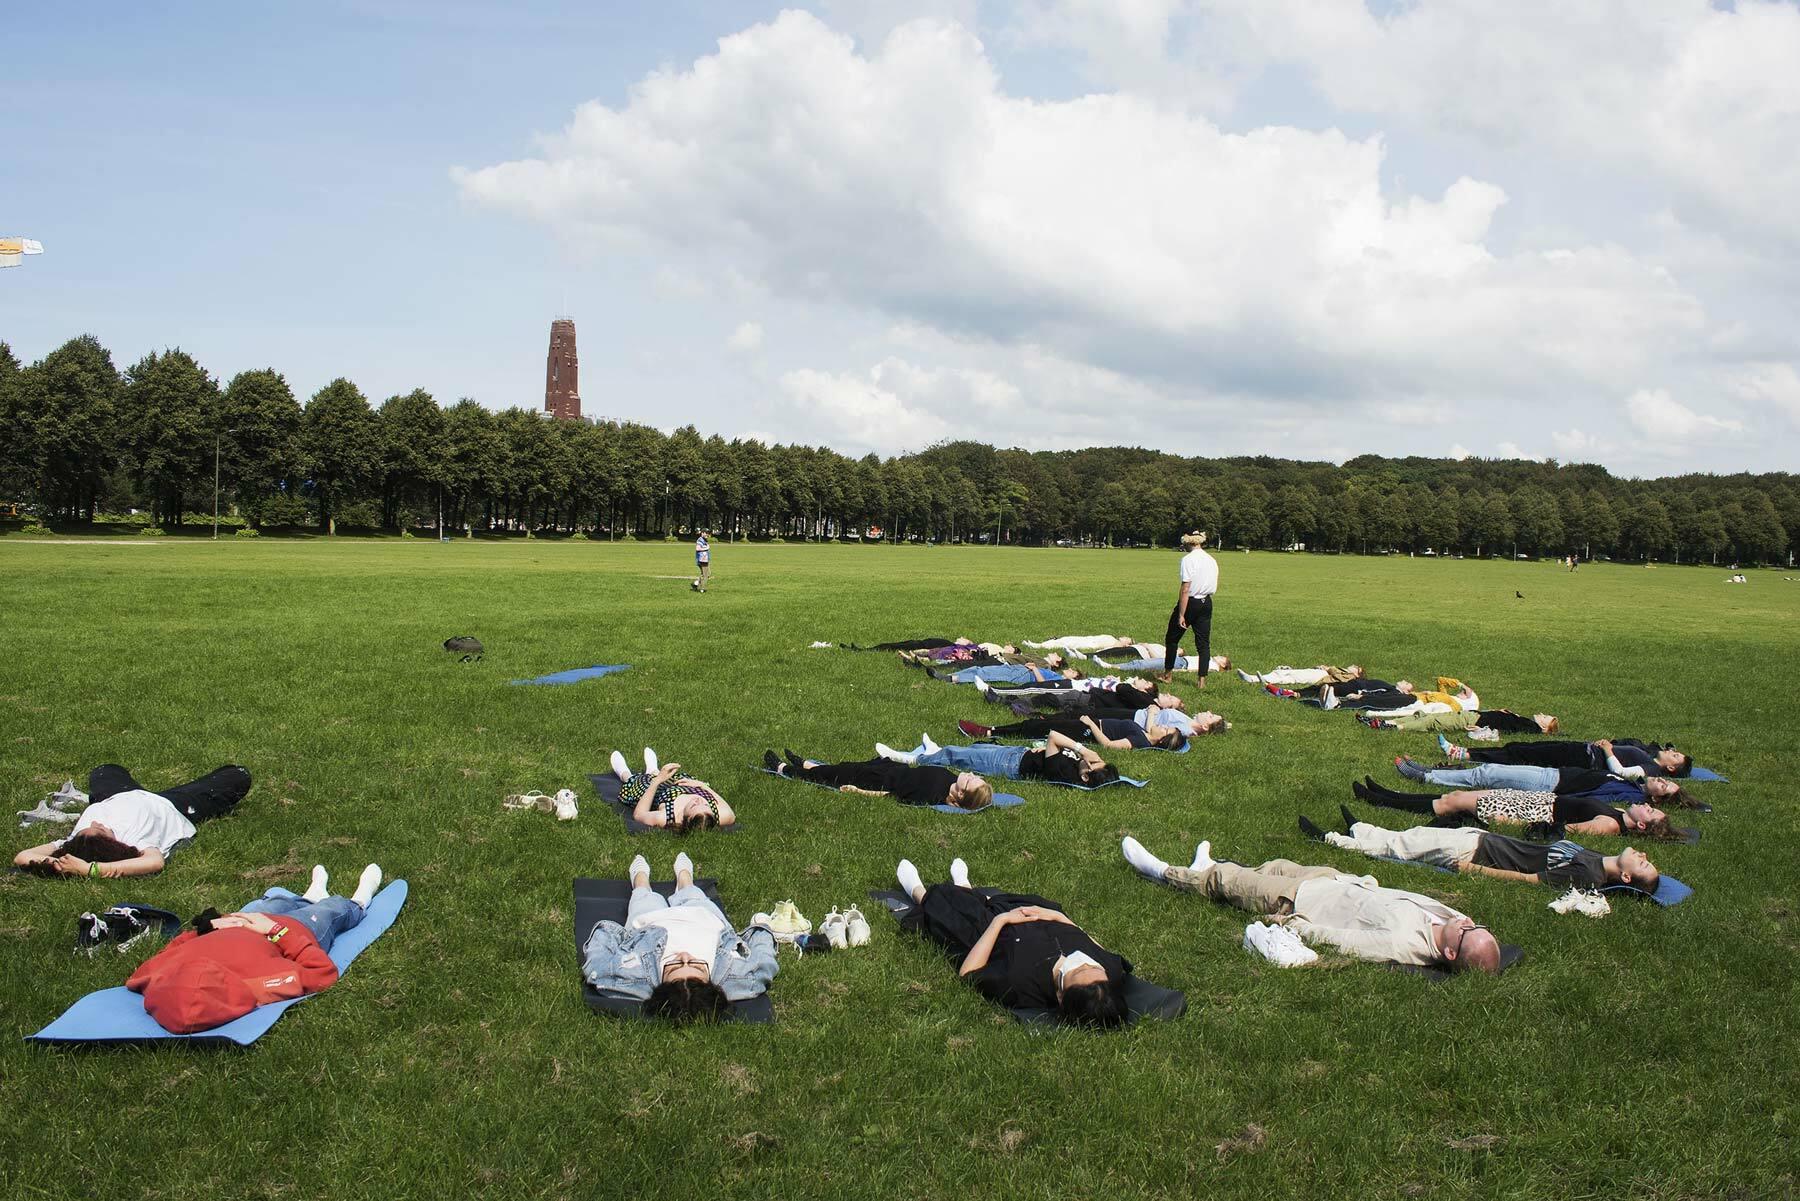 KABK introdagen 2021 - Yoga at the Malieveld